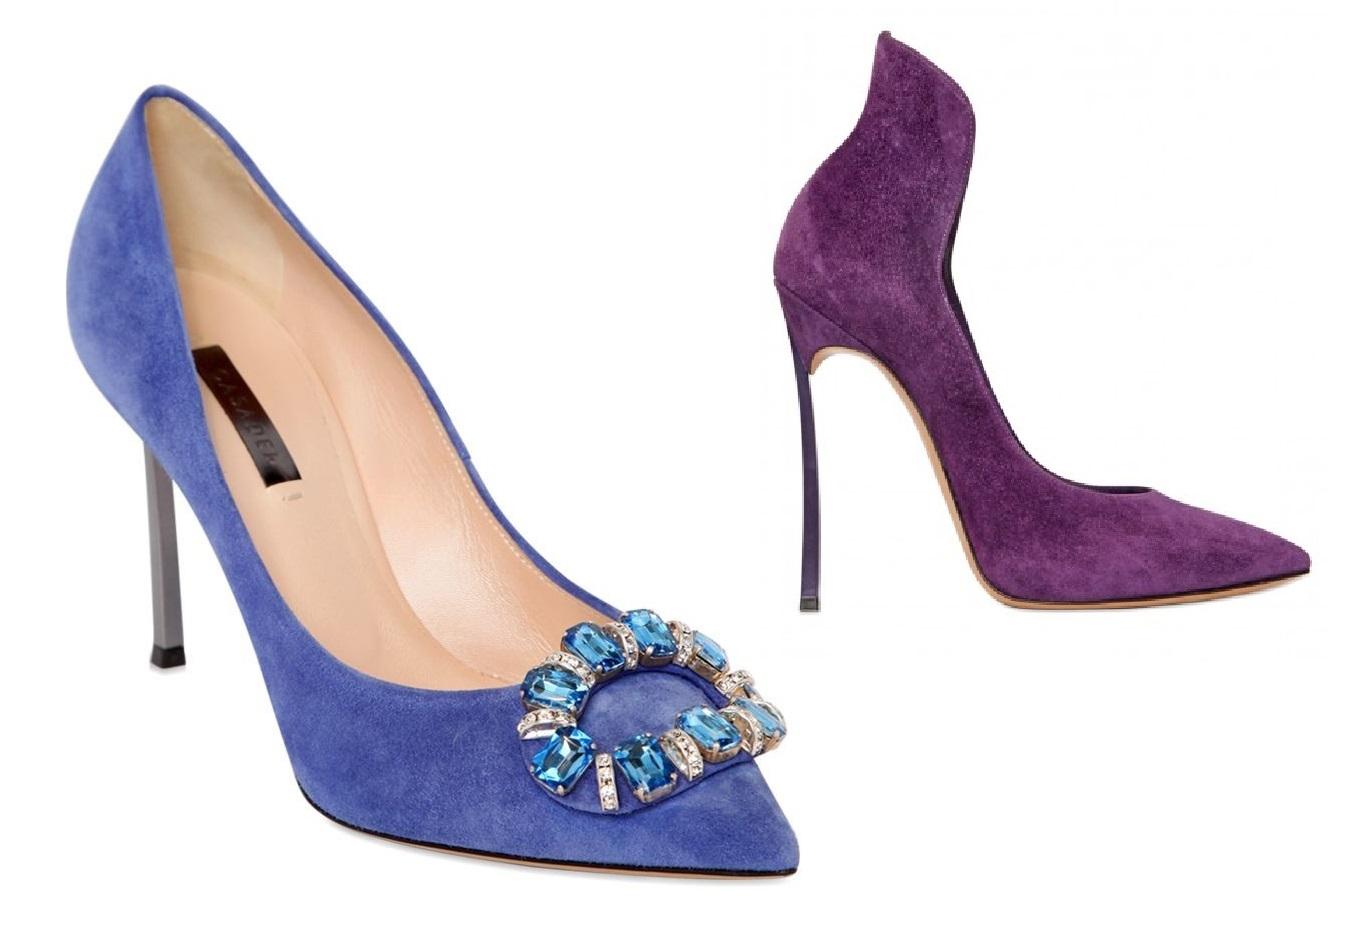 personal shopper, tacchi, calzature, shopping a Milano, Shopping tours, consulente d'immagine, silk gift milan, milano,